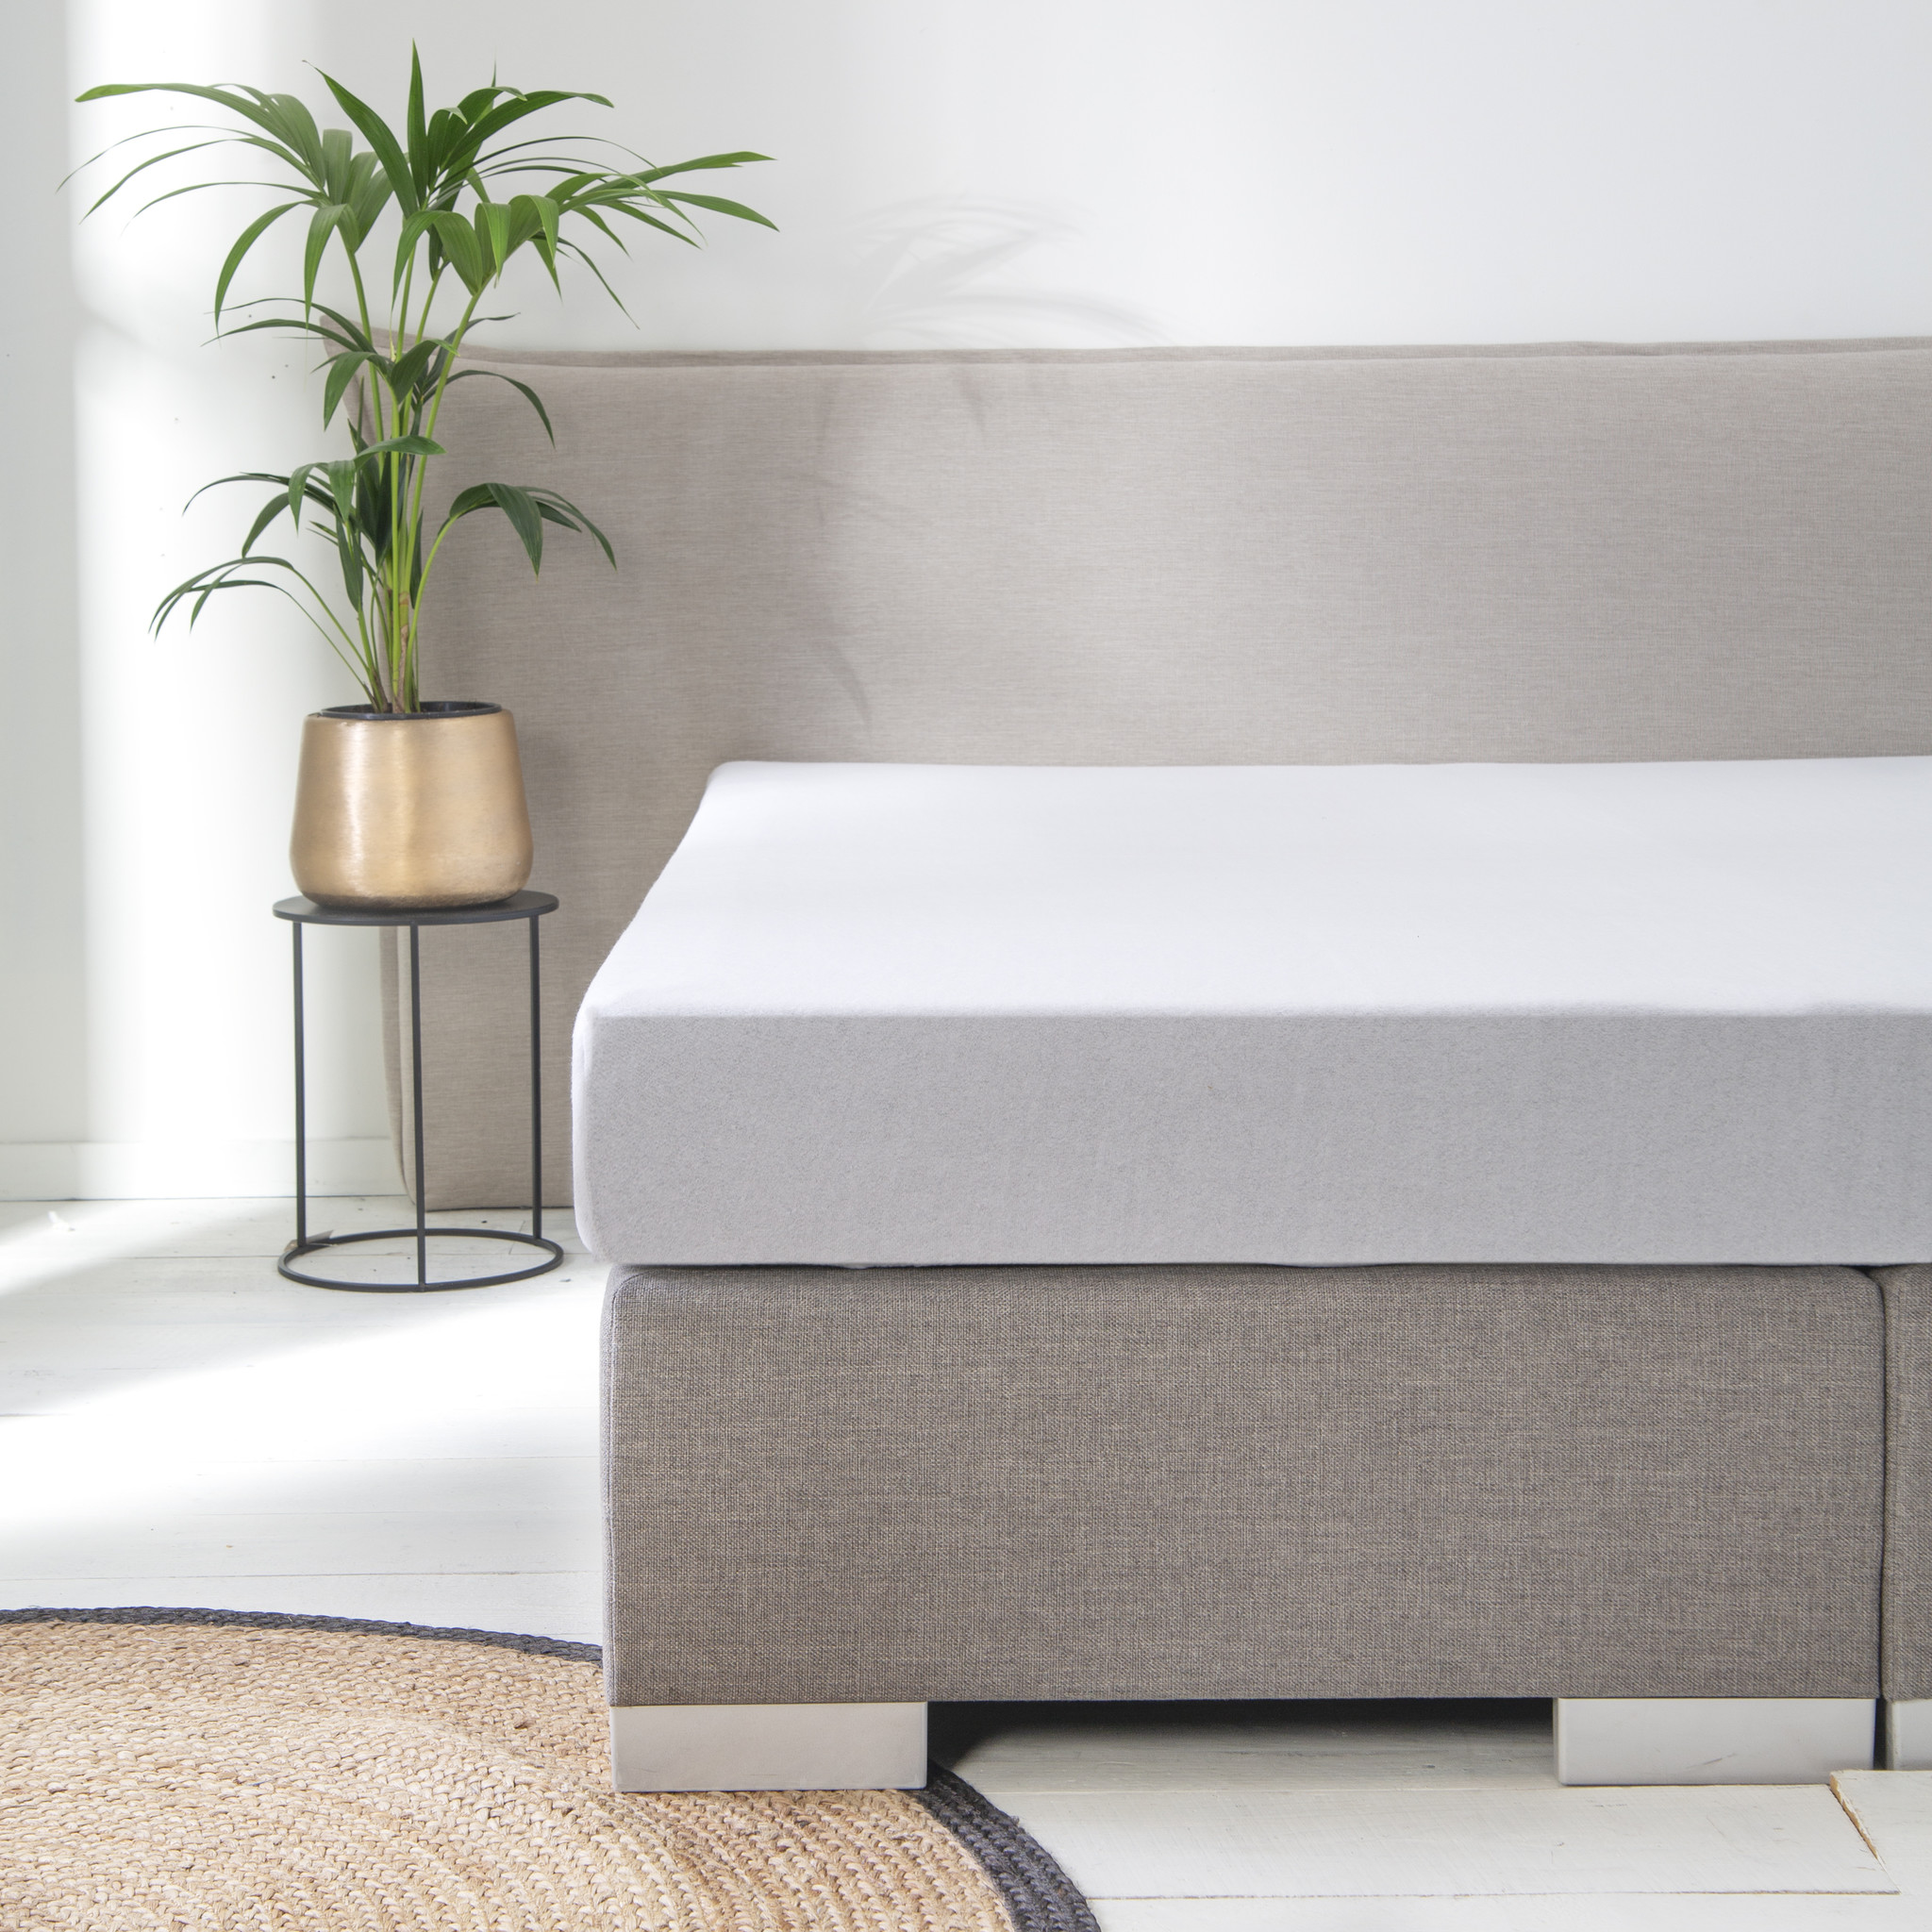 Luna Bedding 2-Pack Molton Luna 180x200 cm